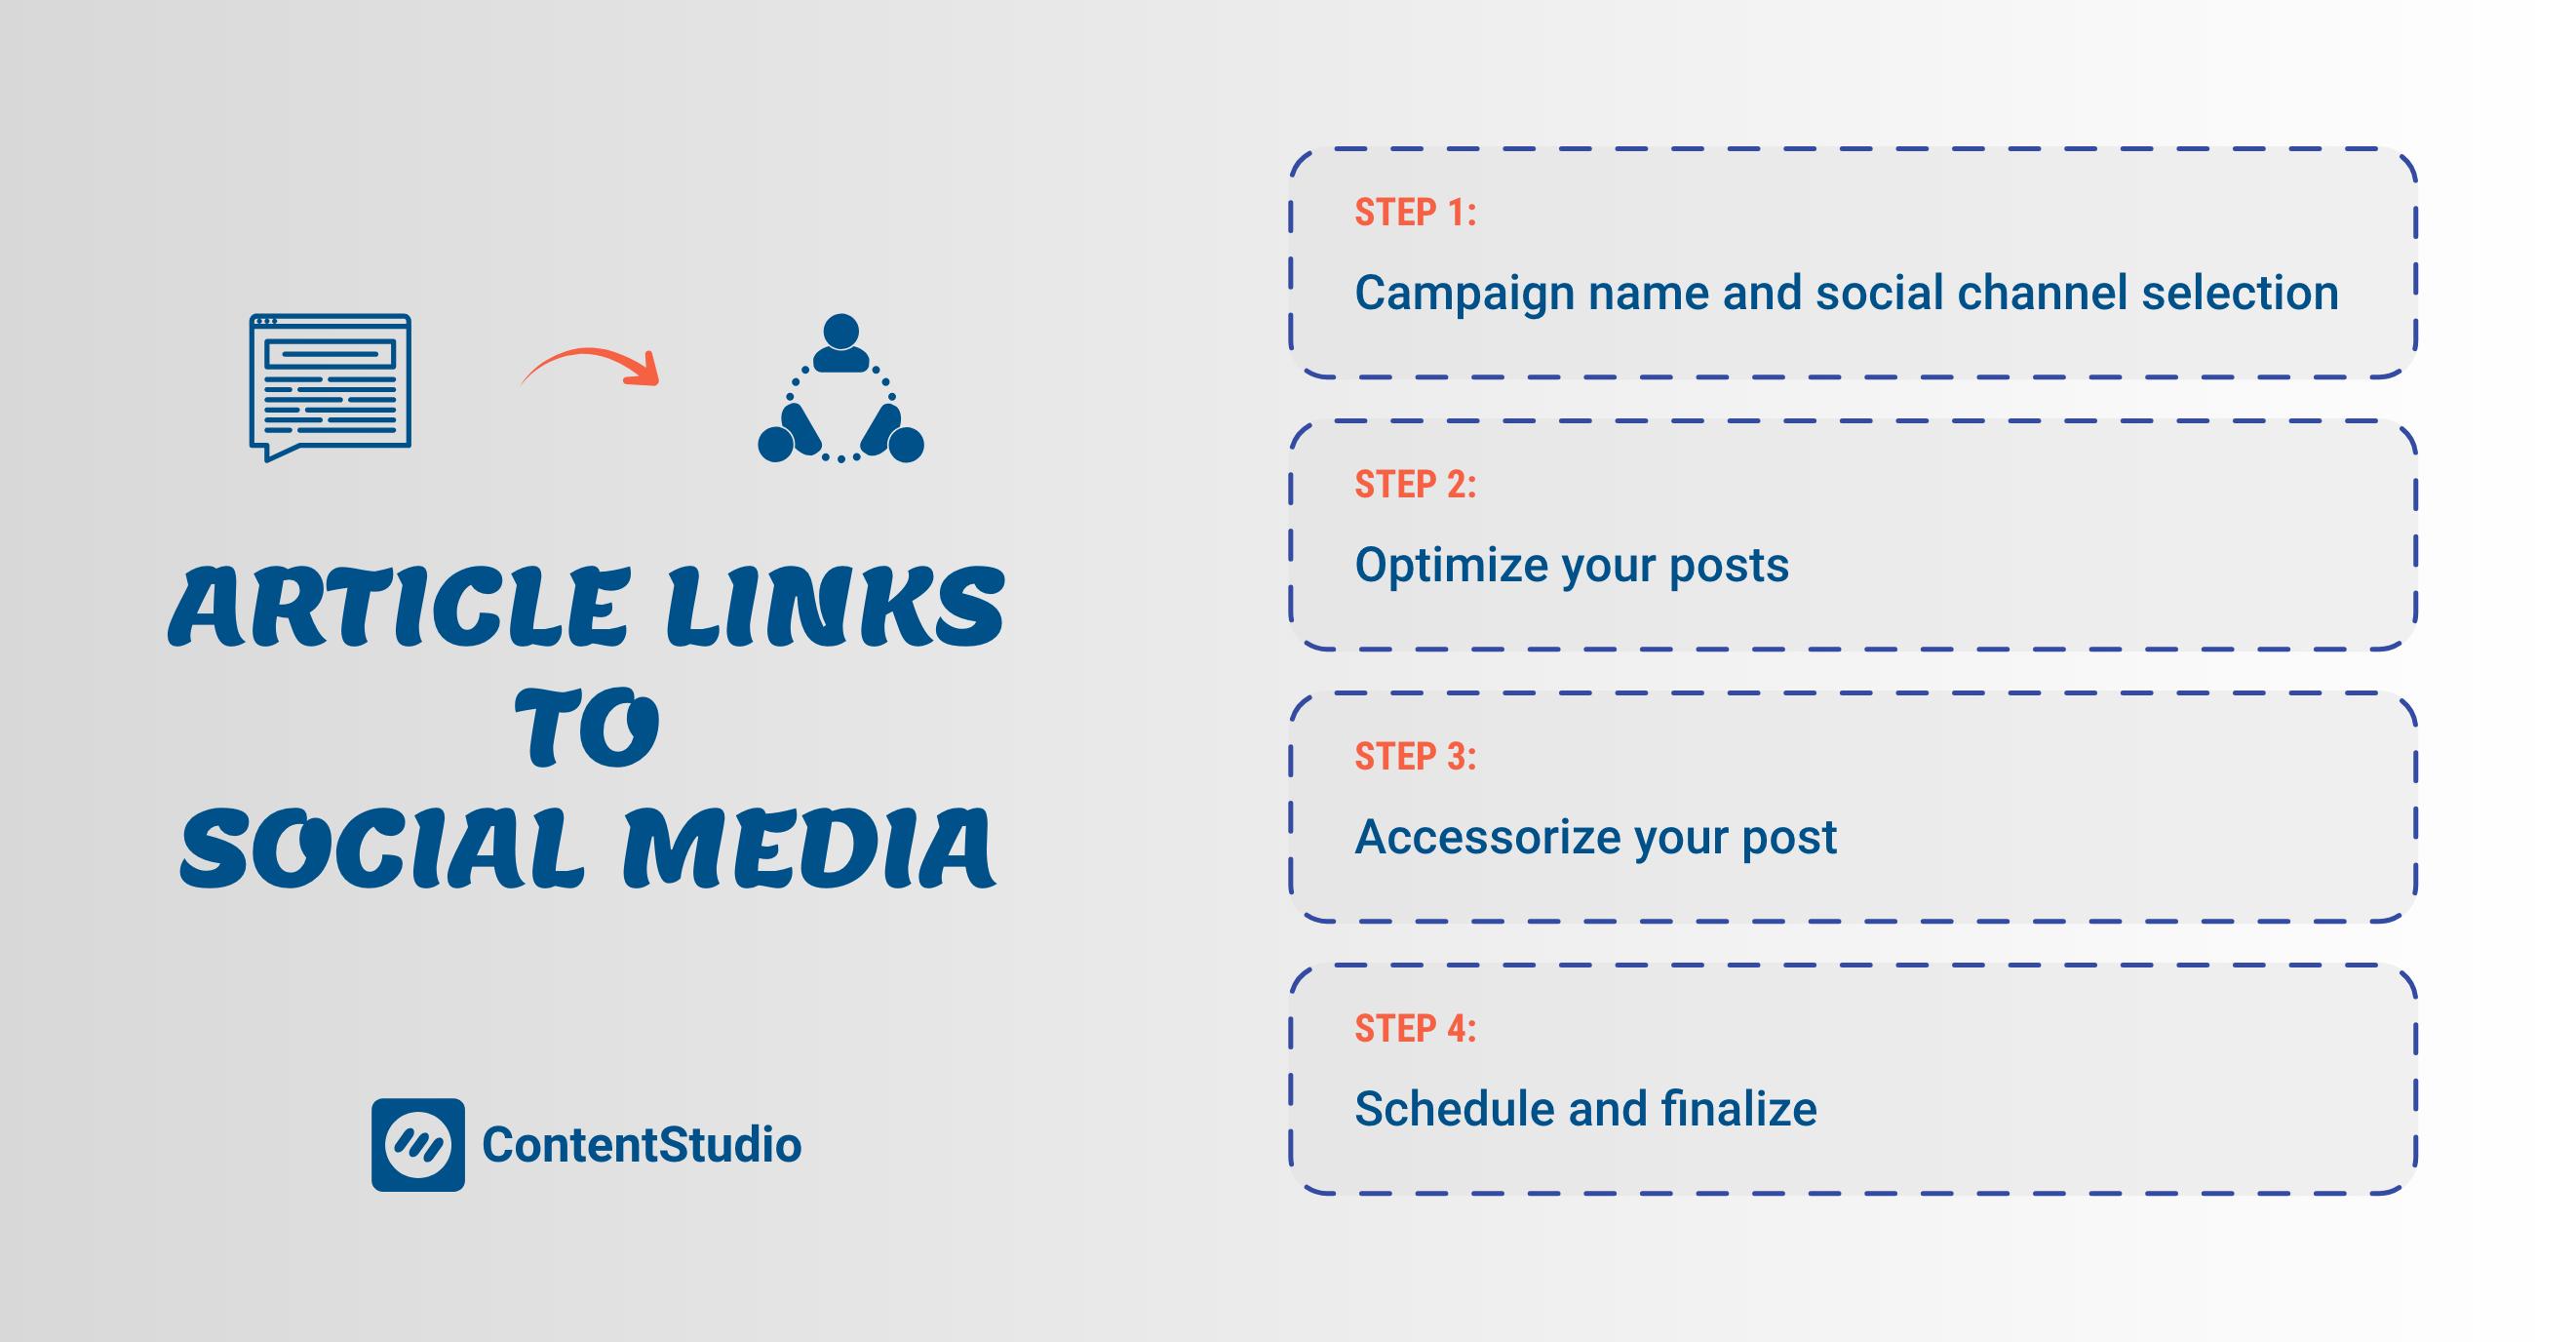 Article links to social media - ContentStudio